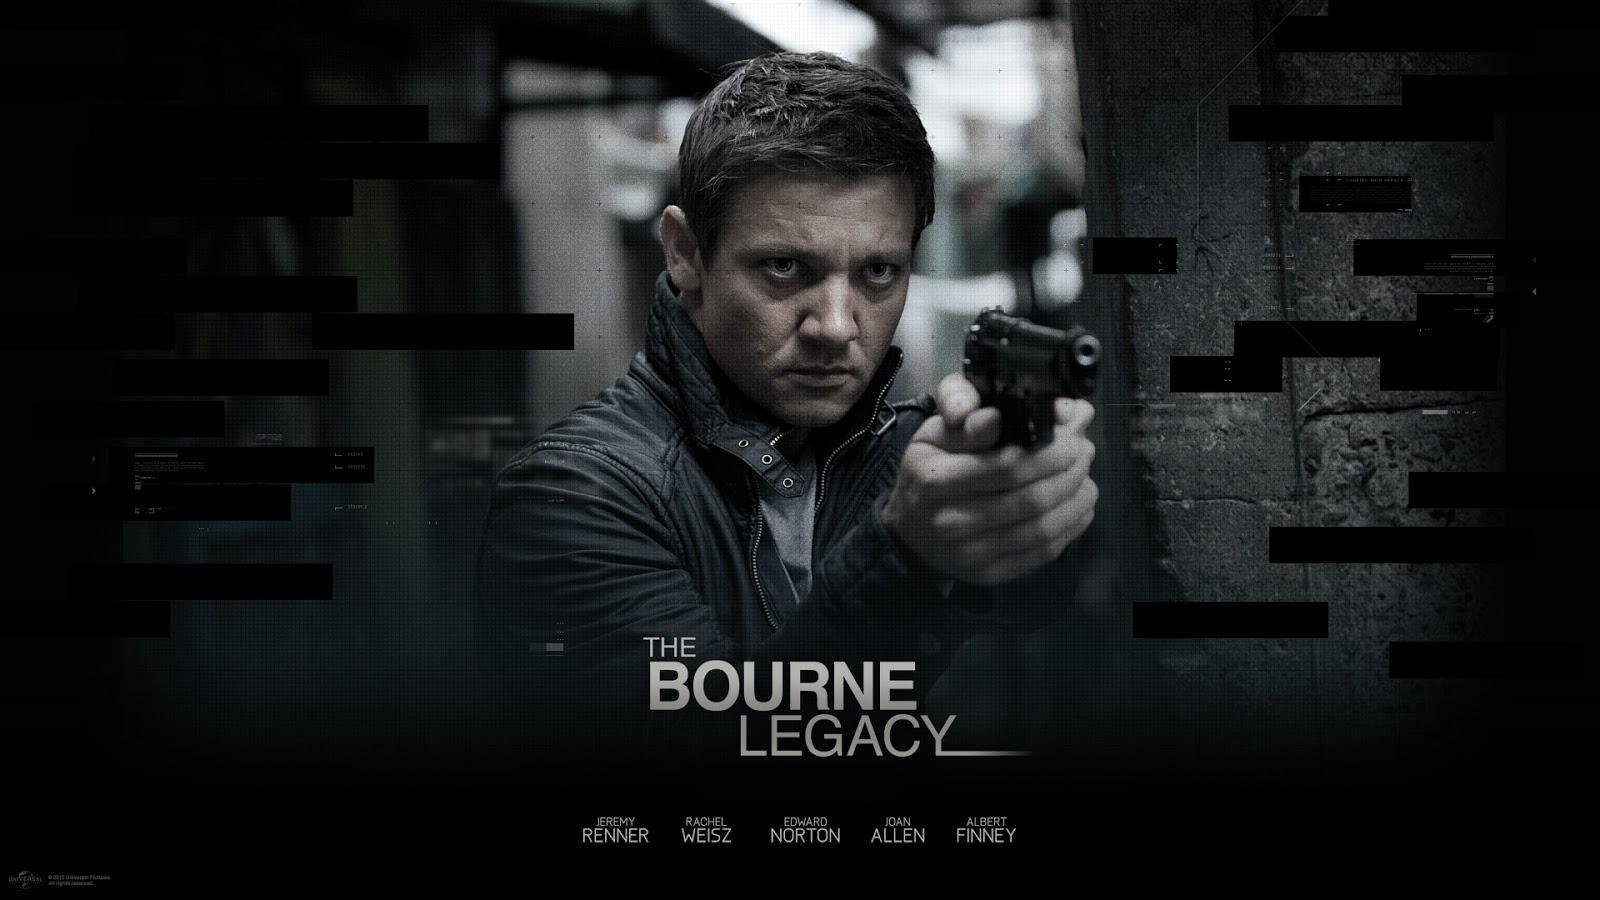 Bourne 5 Starttermin